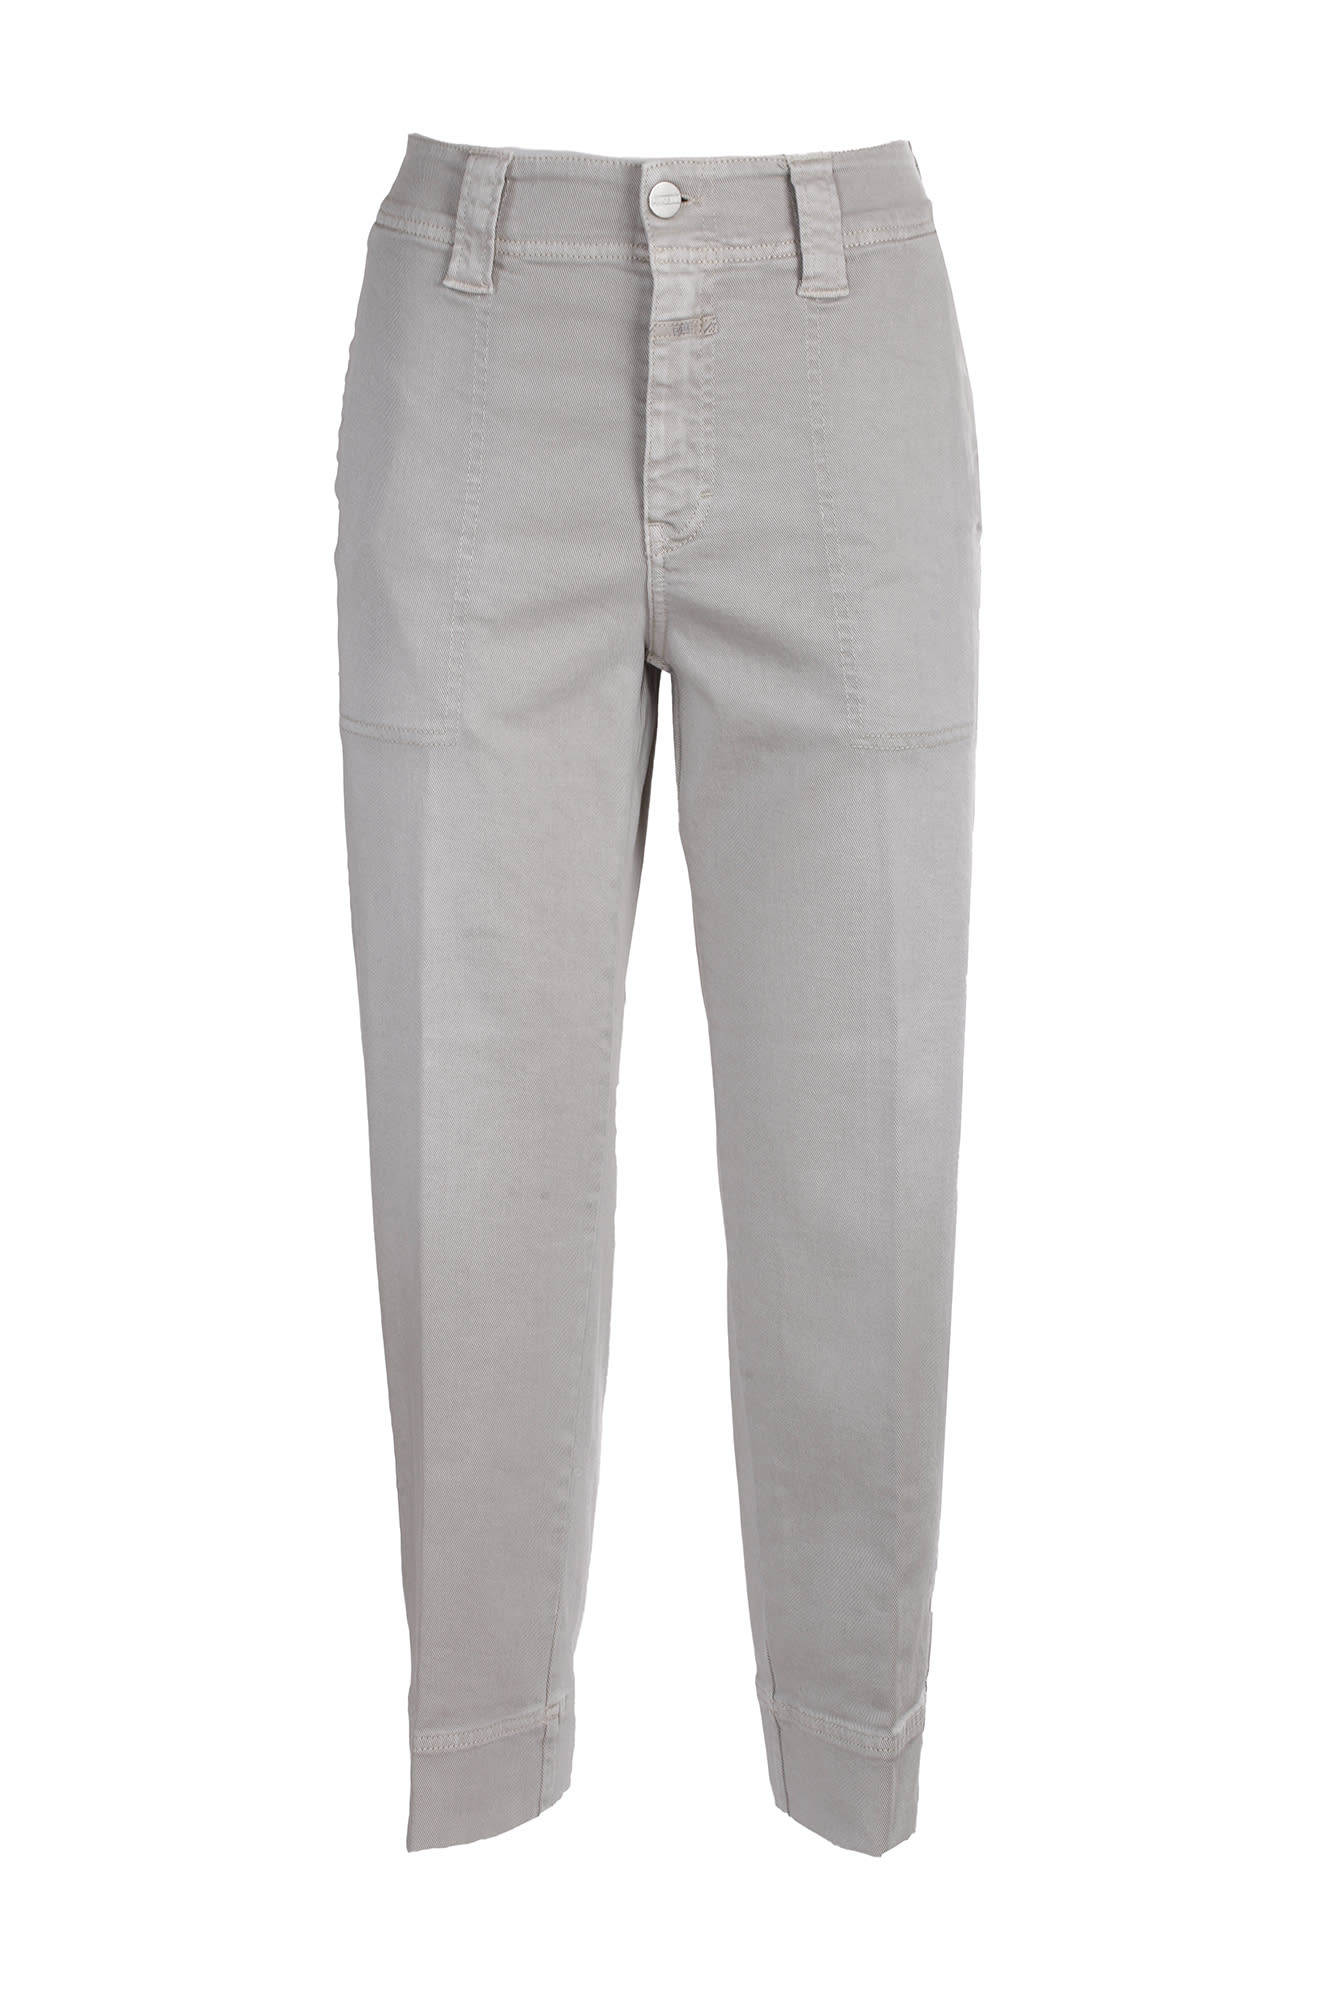 Closed cotton jeans. High waist